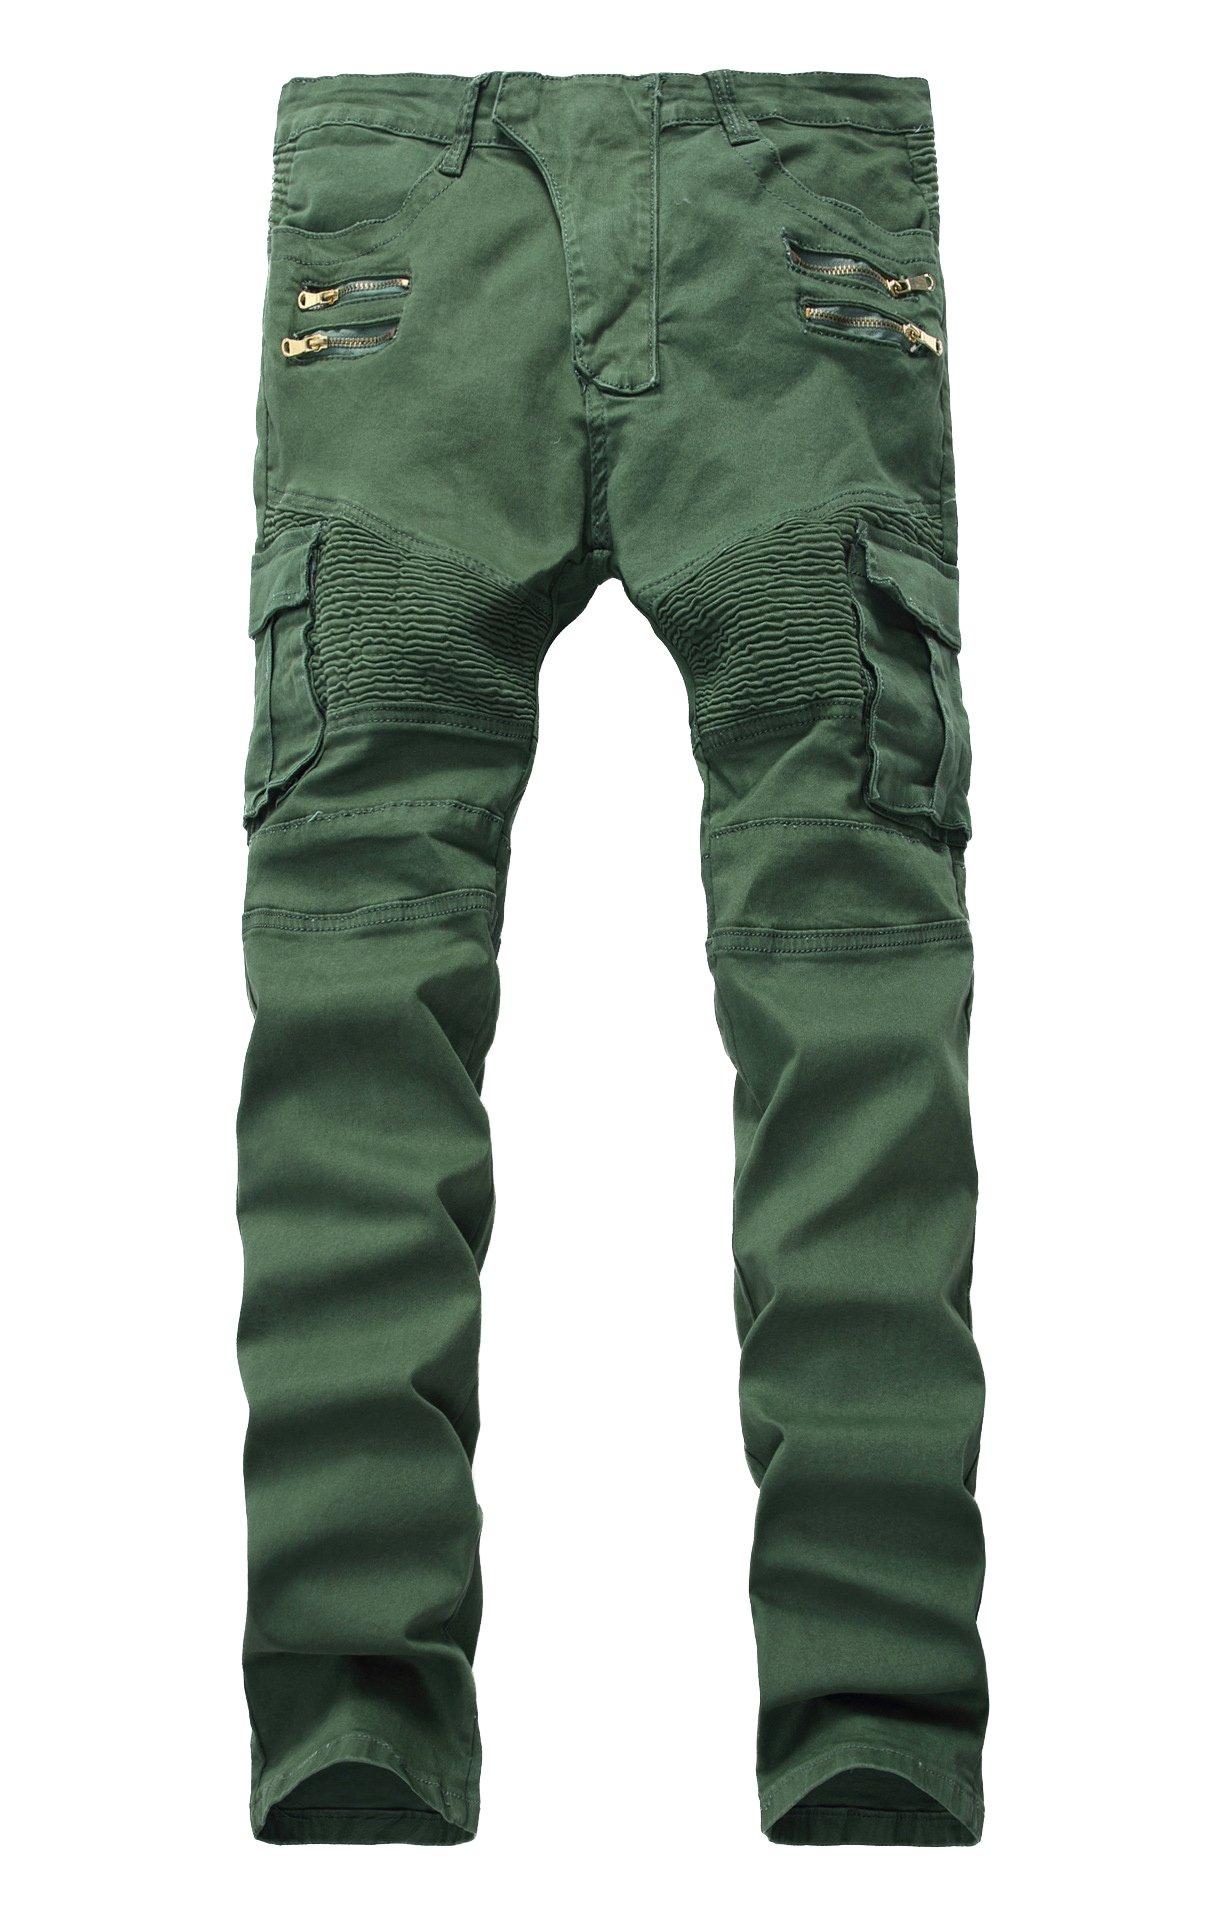 LAMCORD Men's Biker Skinny Slim Fit Stretch Crinkle Cargo Pants Denim Jeans, Army Green, W34